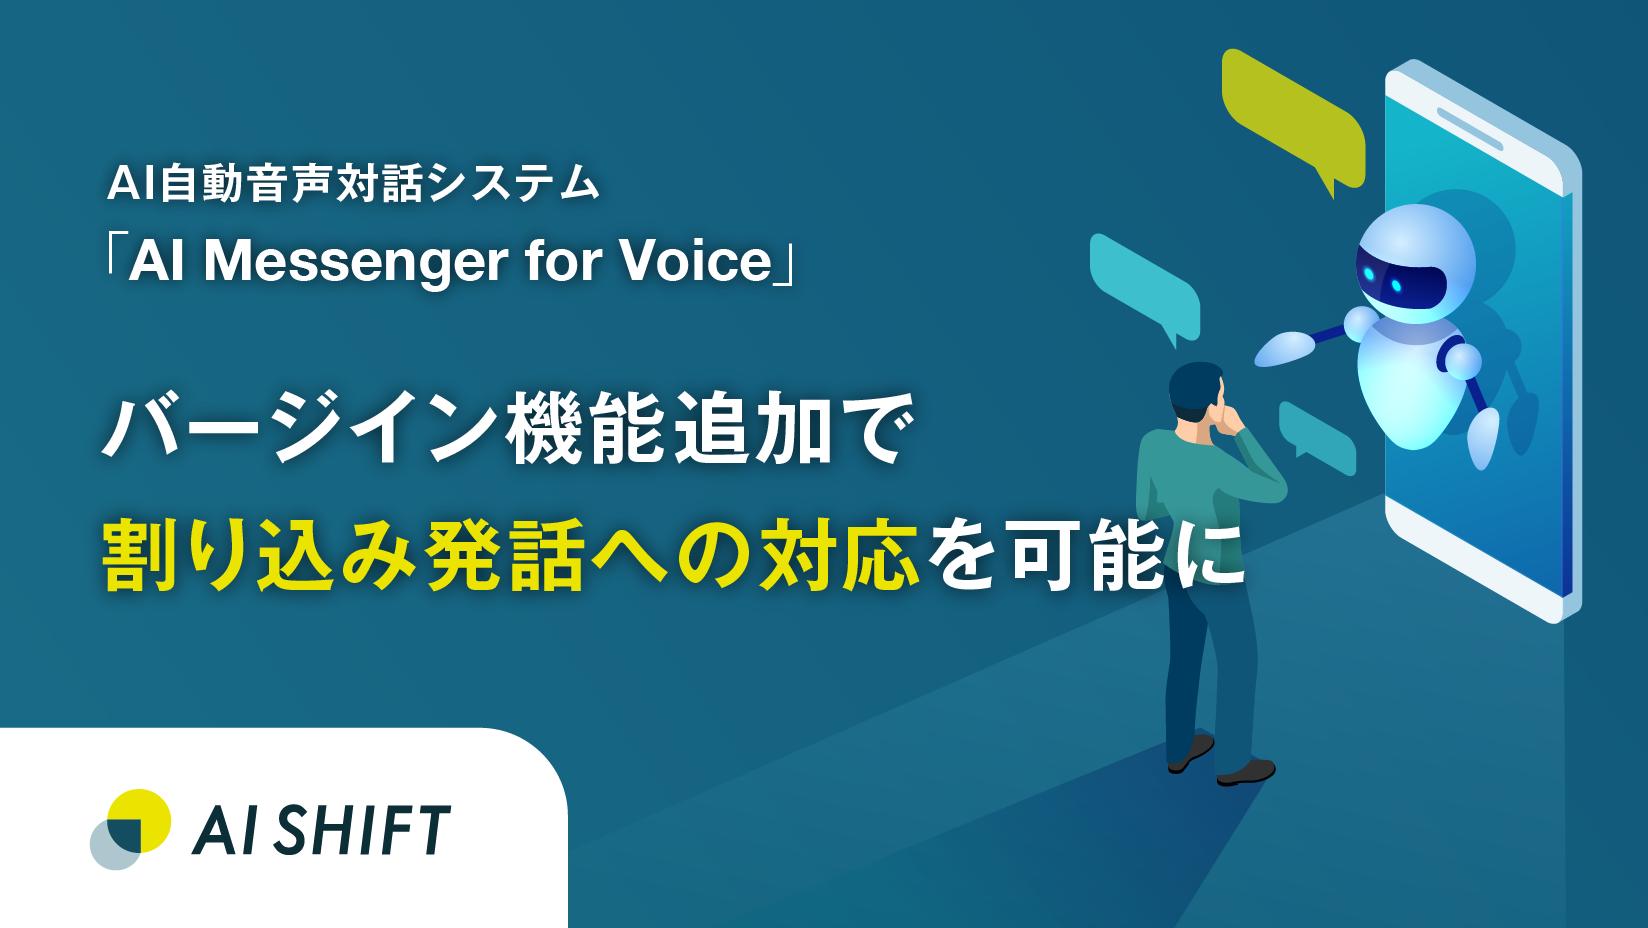 AI自動音声対話システム「AI Messenger for Voice」、バージイン機能追加で割り込み発話への対応を可能に